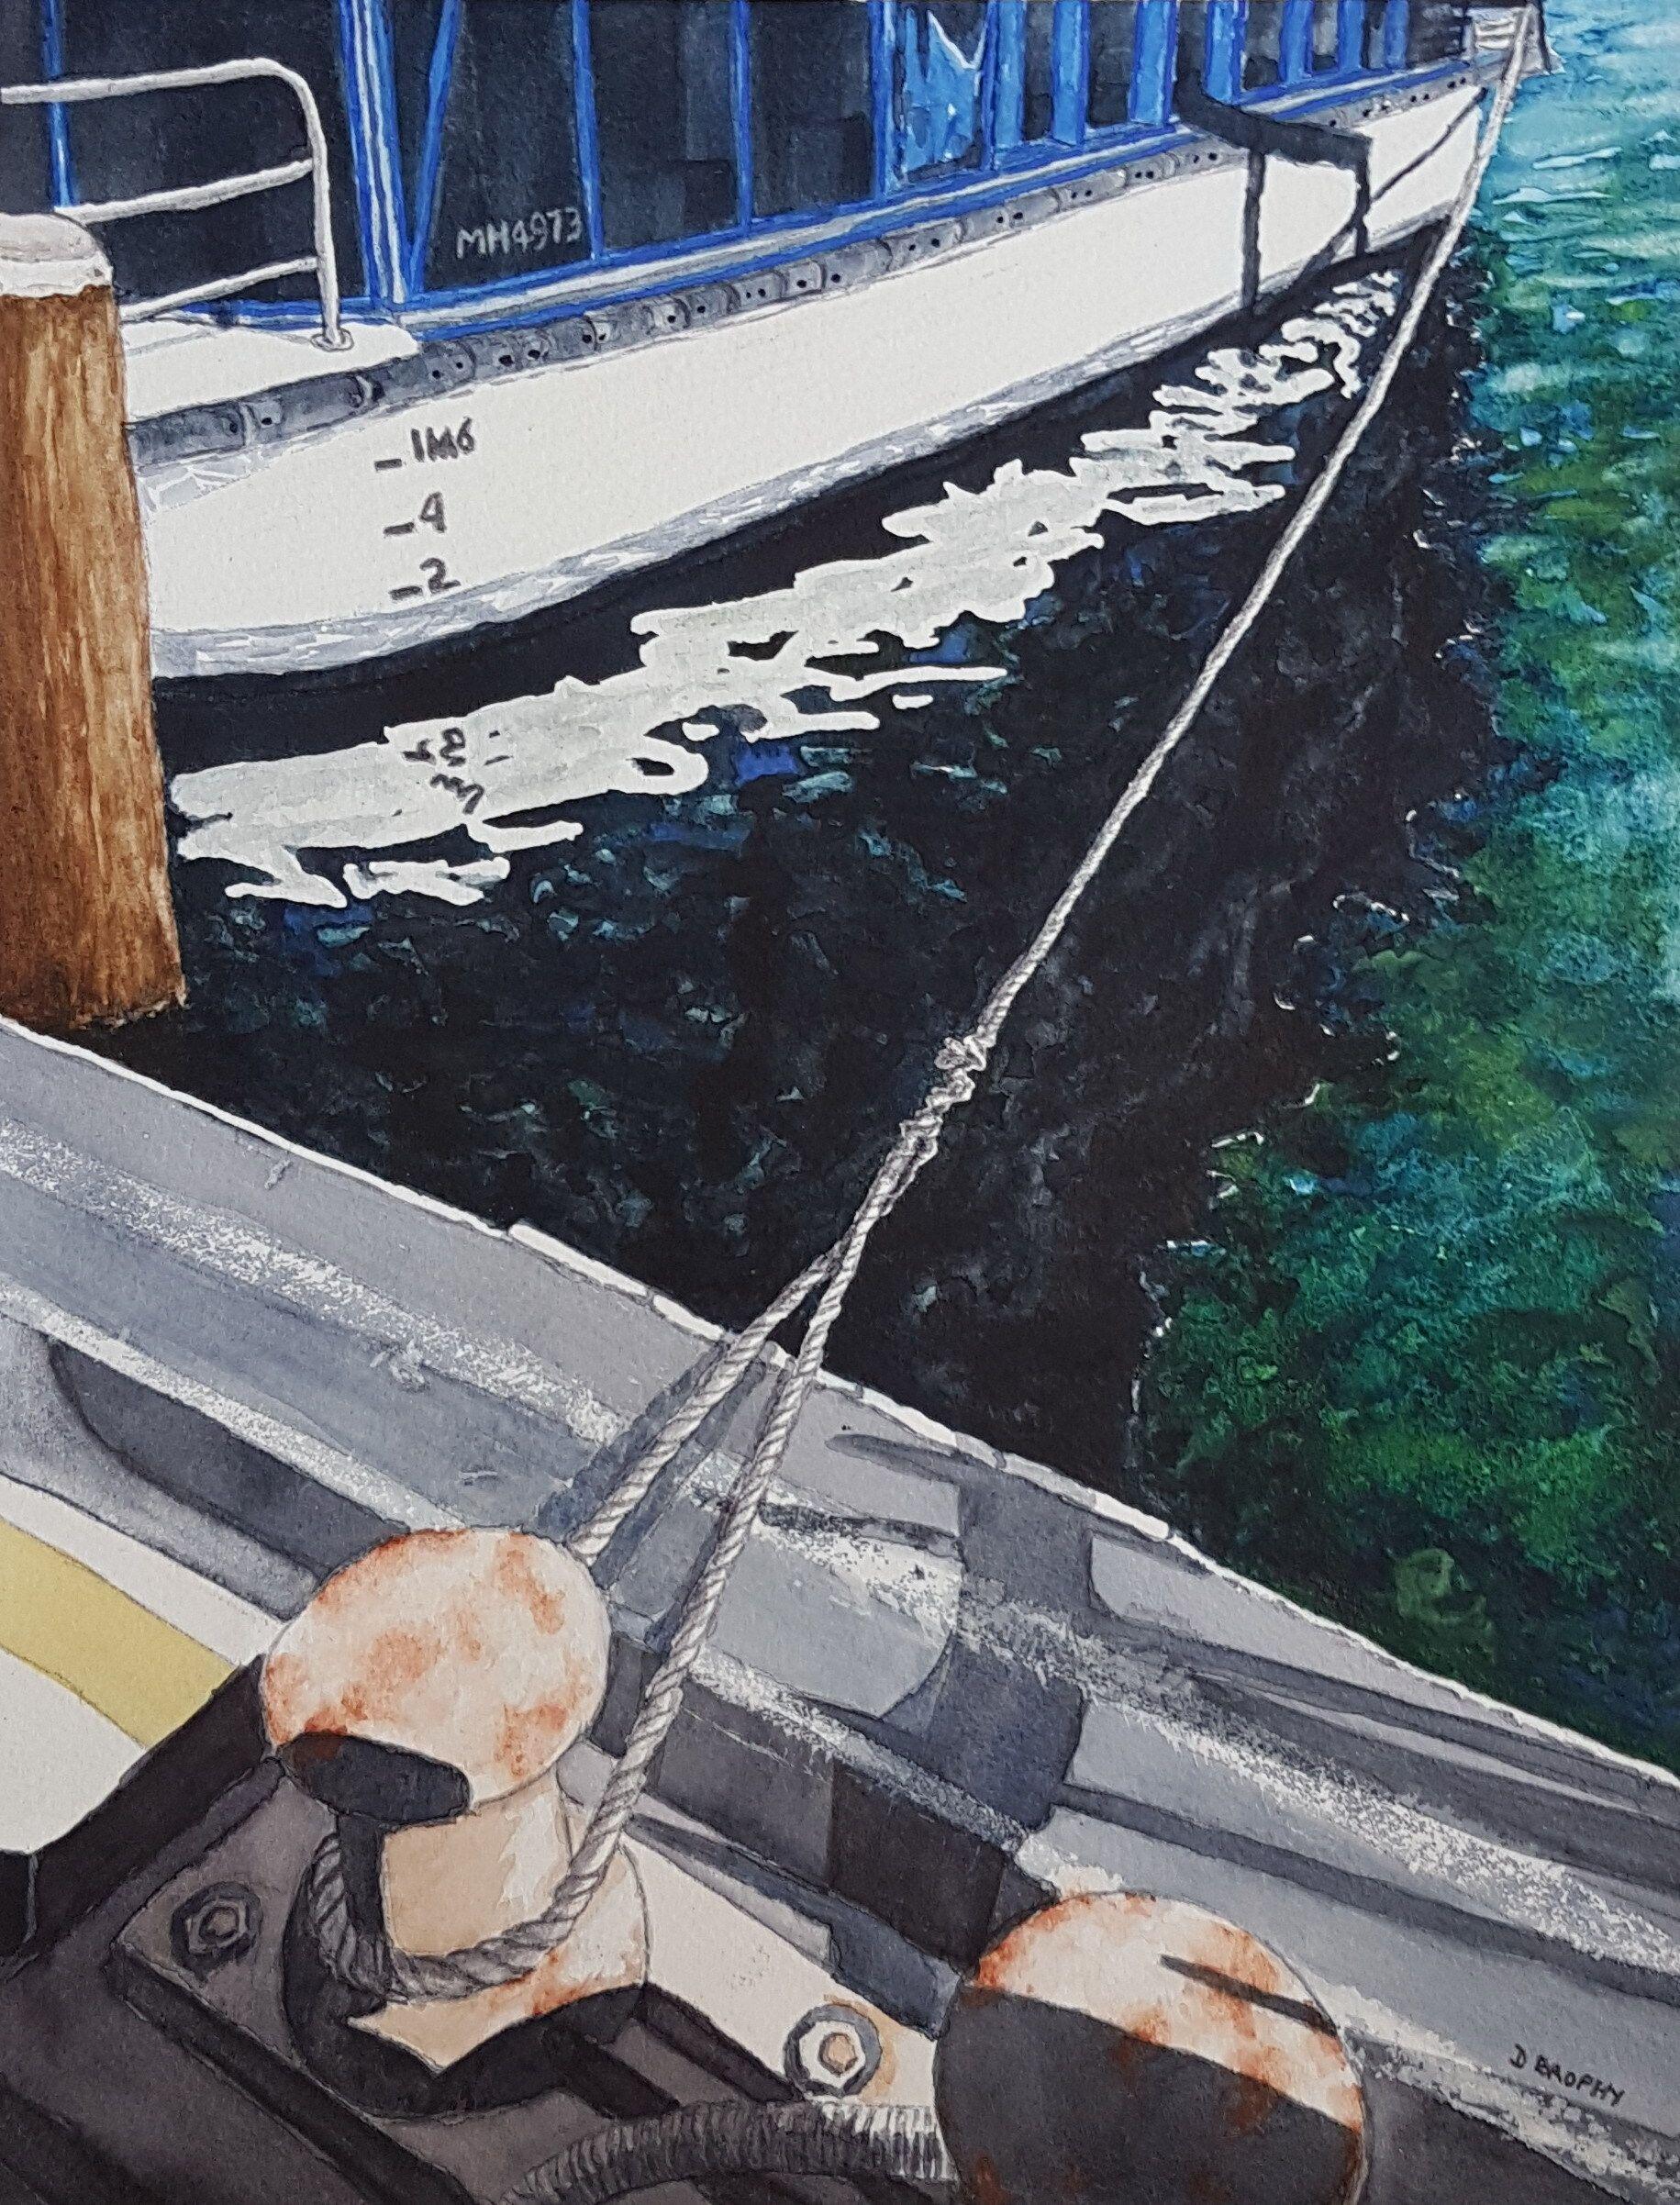 Daytime Mooring Crystal Swan Riverboat Perth By Debbie Brophy Paintings For Sale Bluethumb Online Art River Boat Online Art Gallery Australian Artists